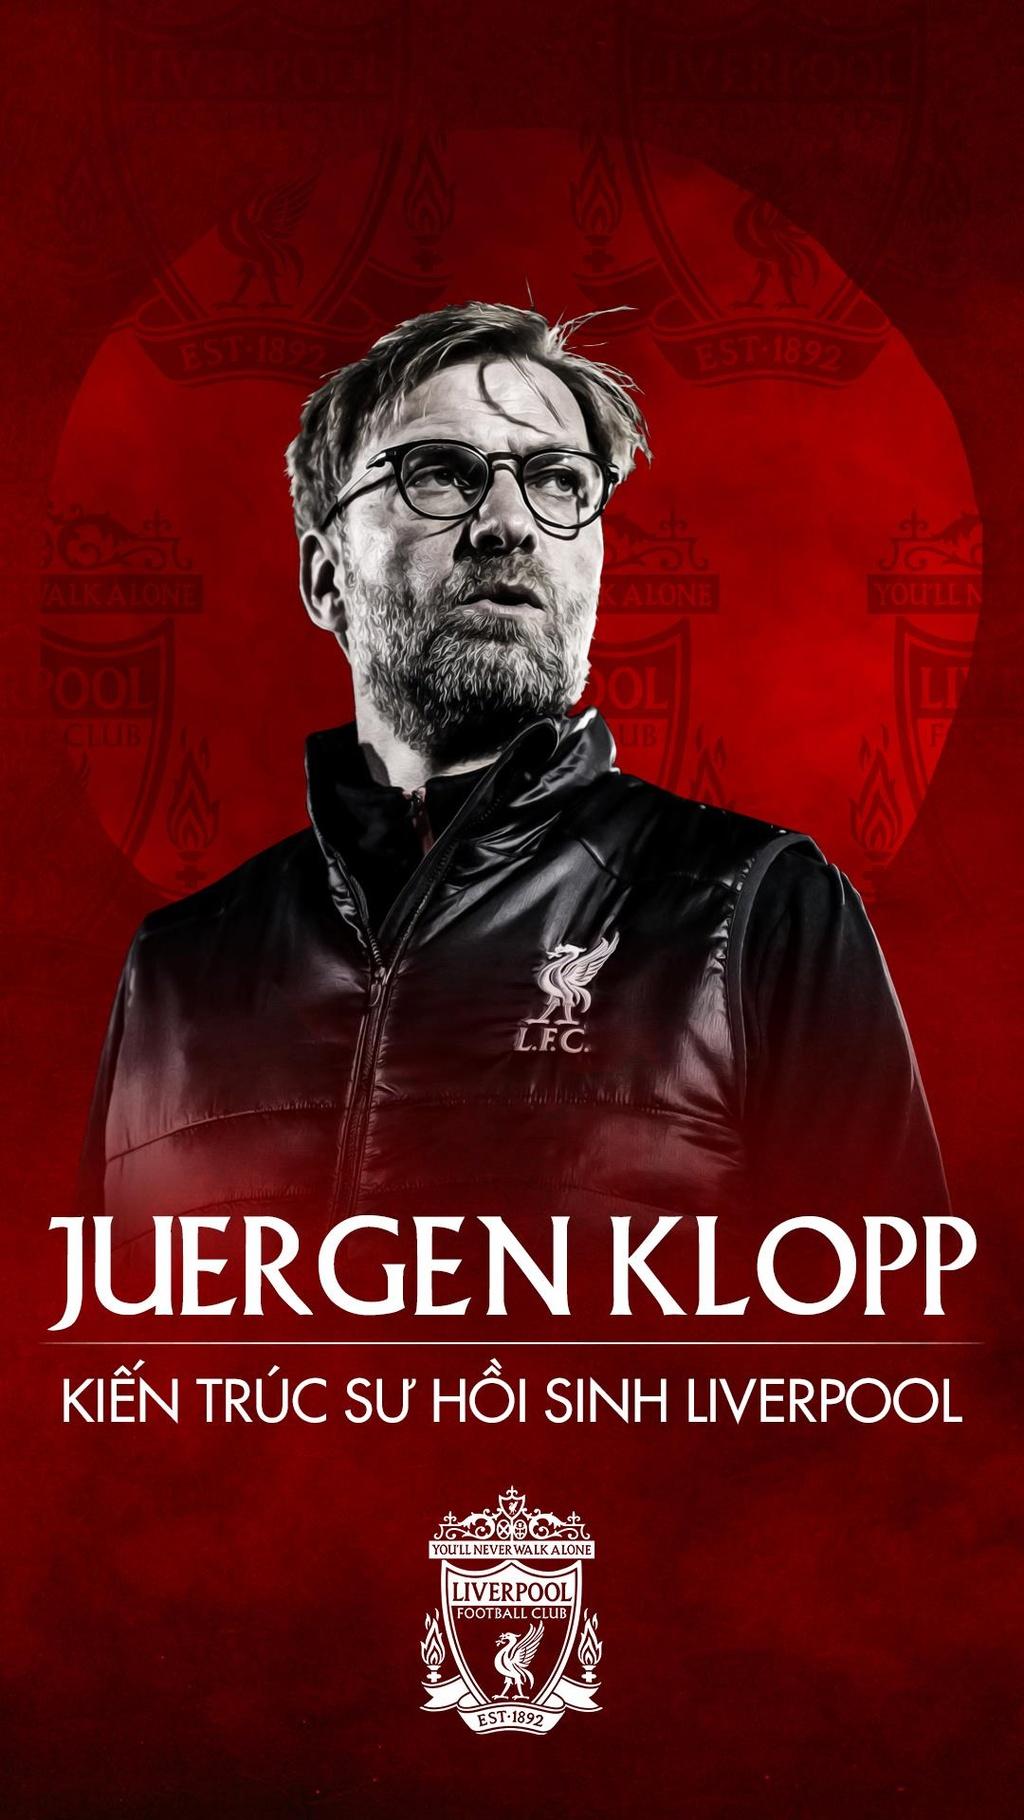 Juergen Klopp - kien truc su hoi sinh Liverpool hinh anh 1